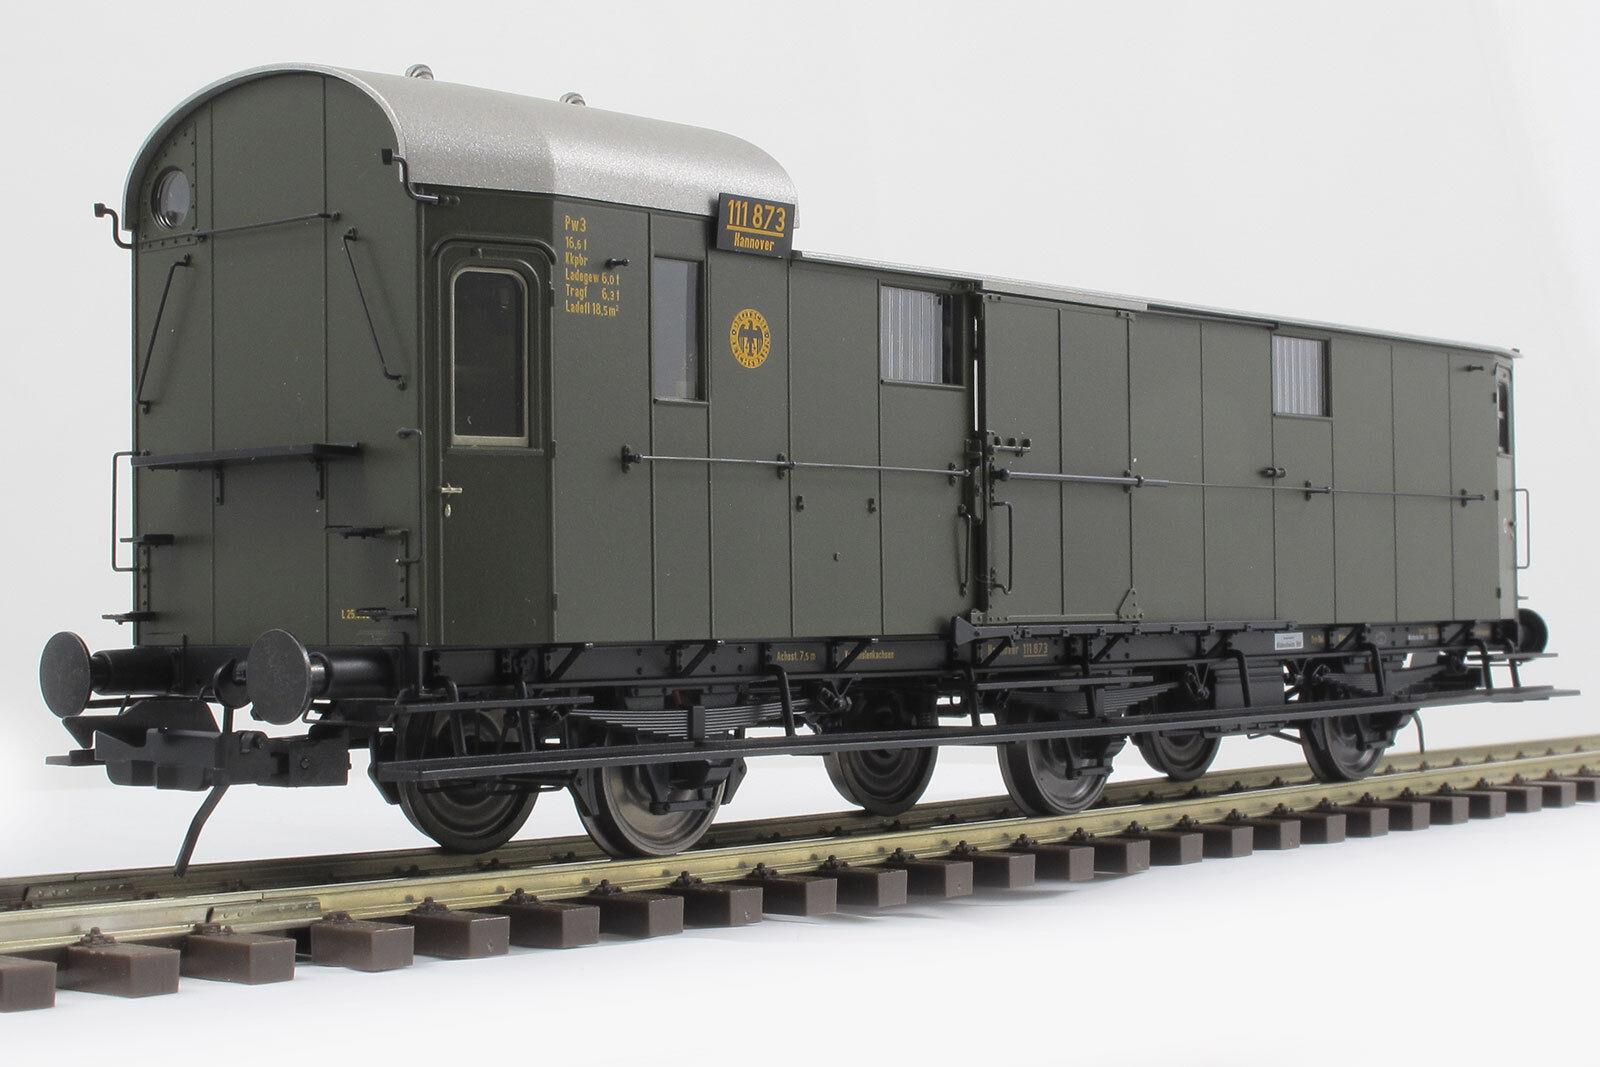 Lenz Scala 0 4116901 Prussiano Vagone borsaagli modellololo Pw3 Merce Nuova